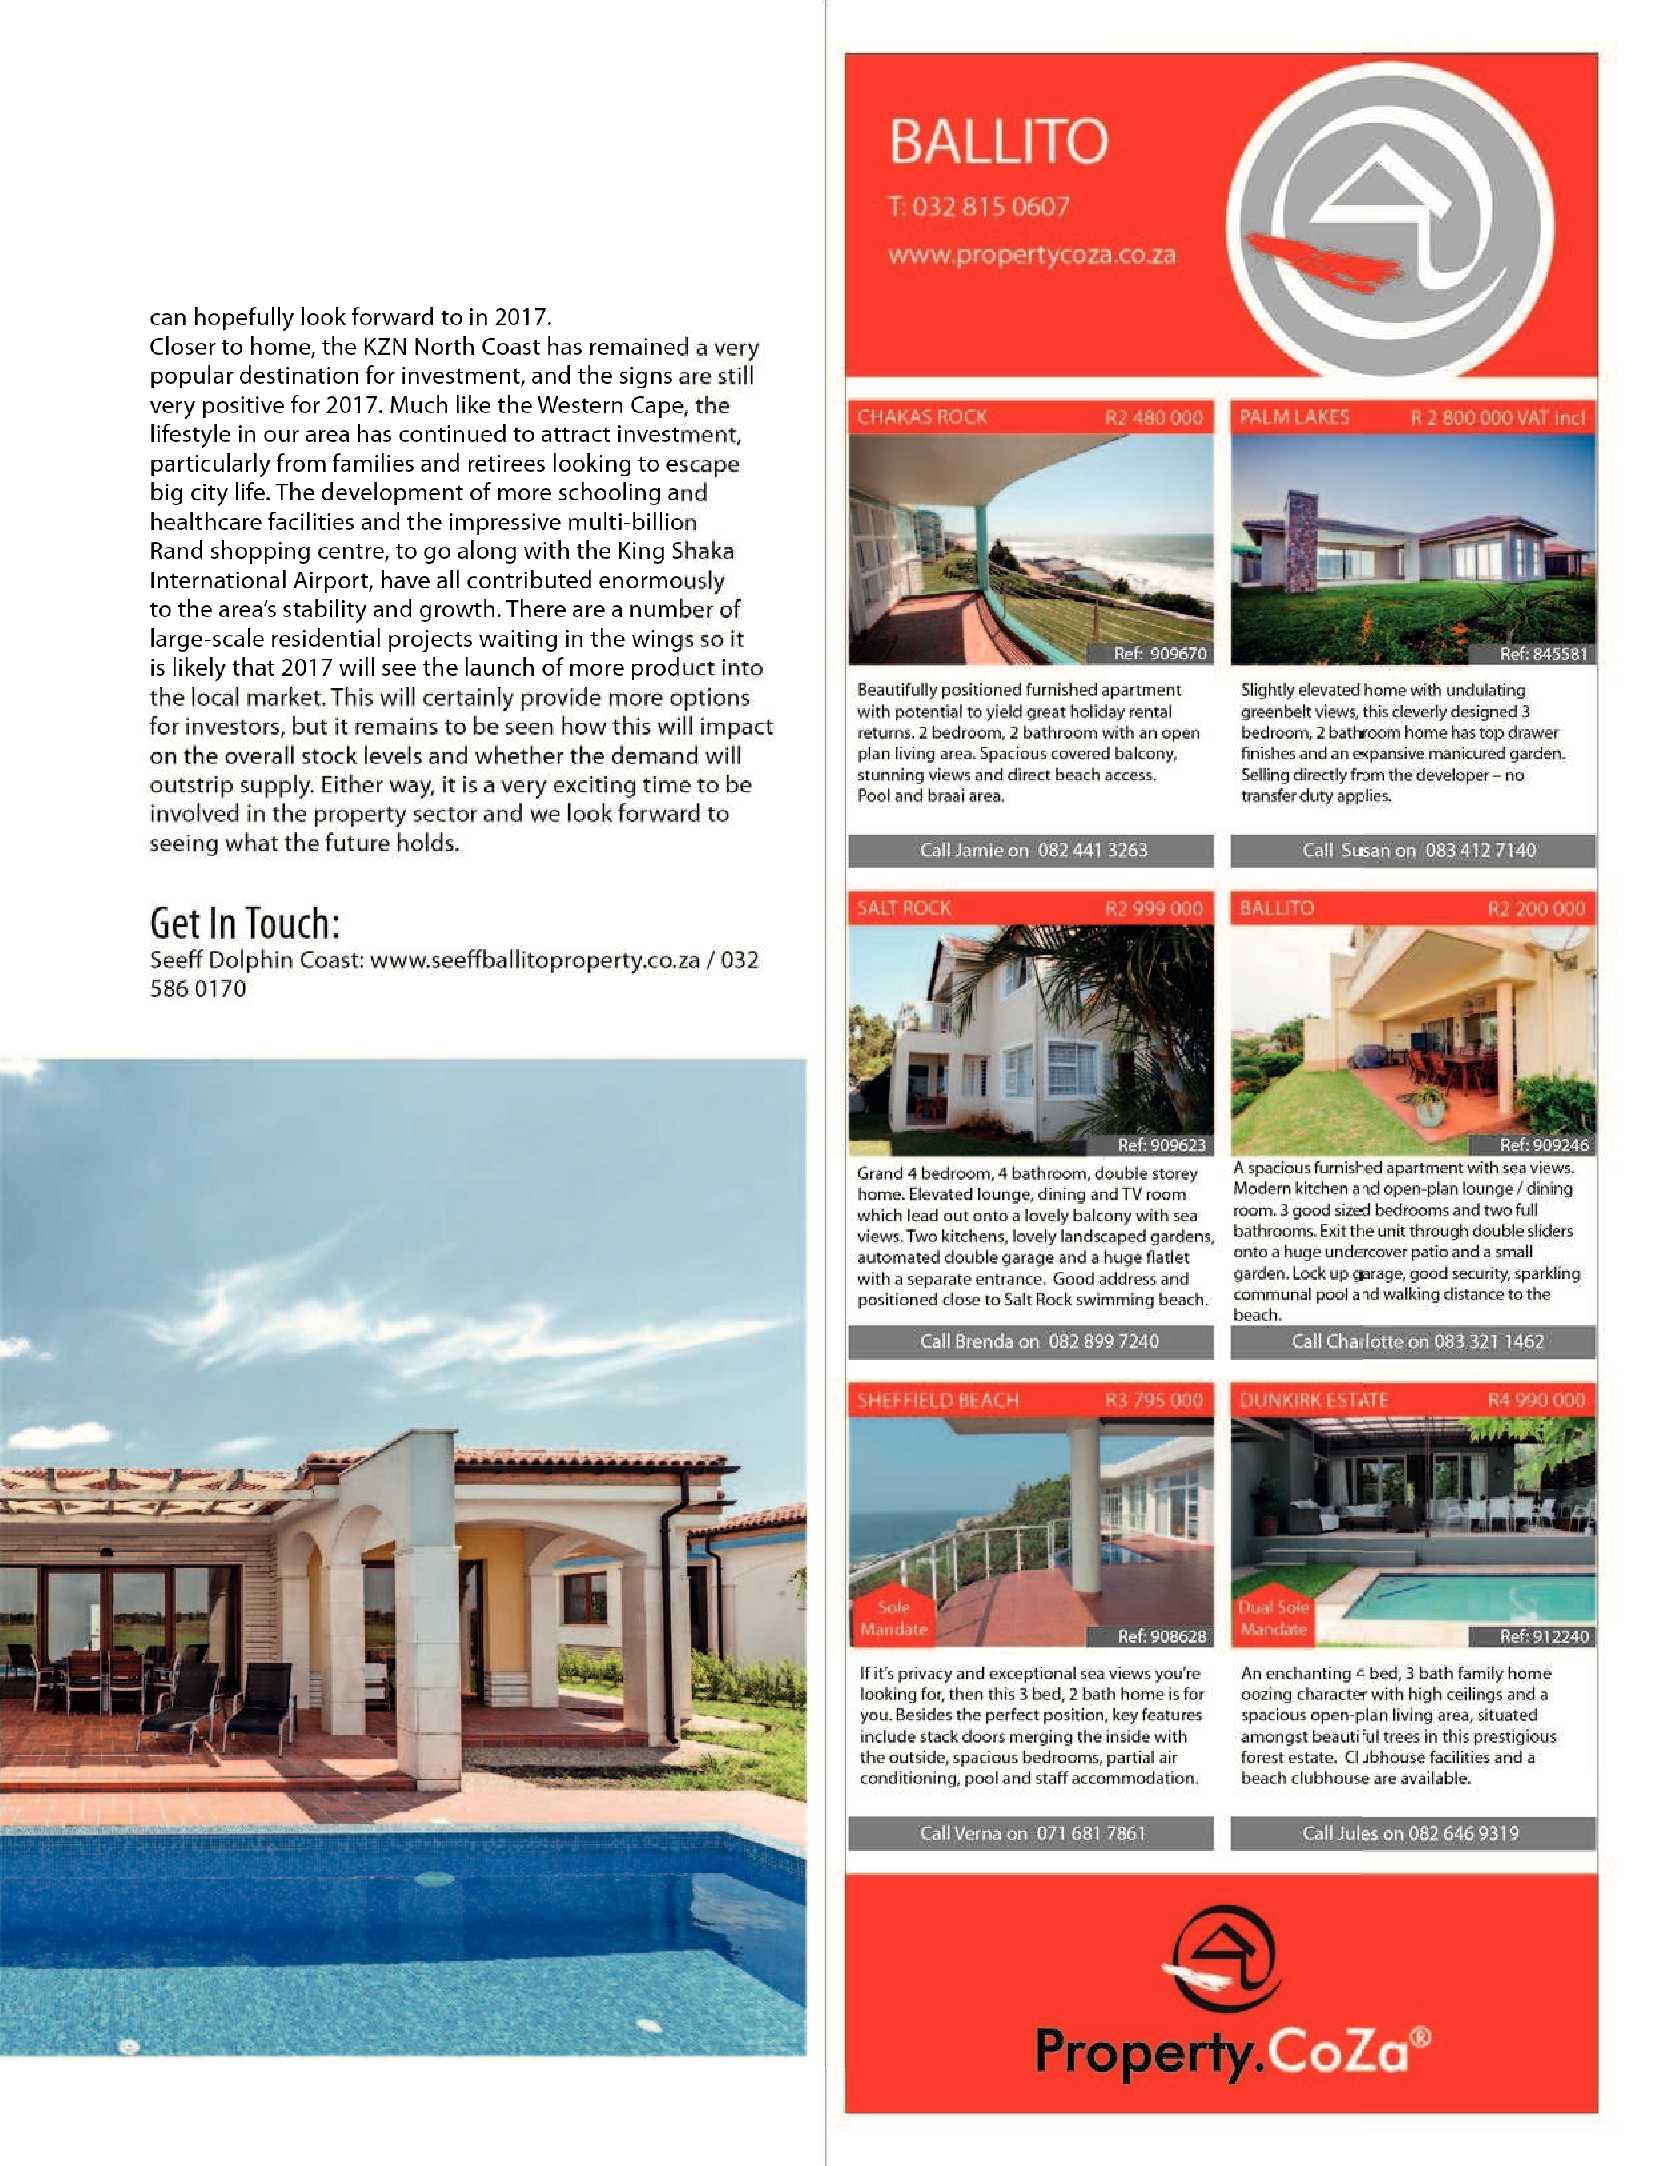 get-magazine-ballitoumhlanga-december-2016-january-2017-epapers-page-97